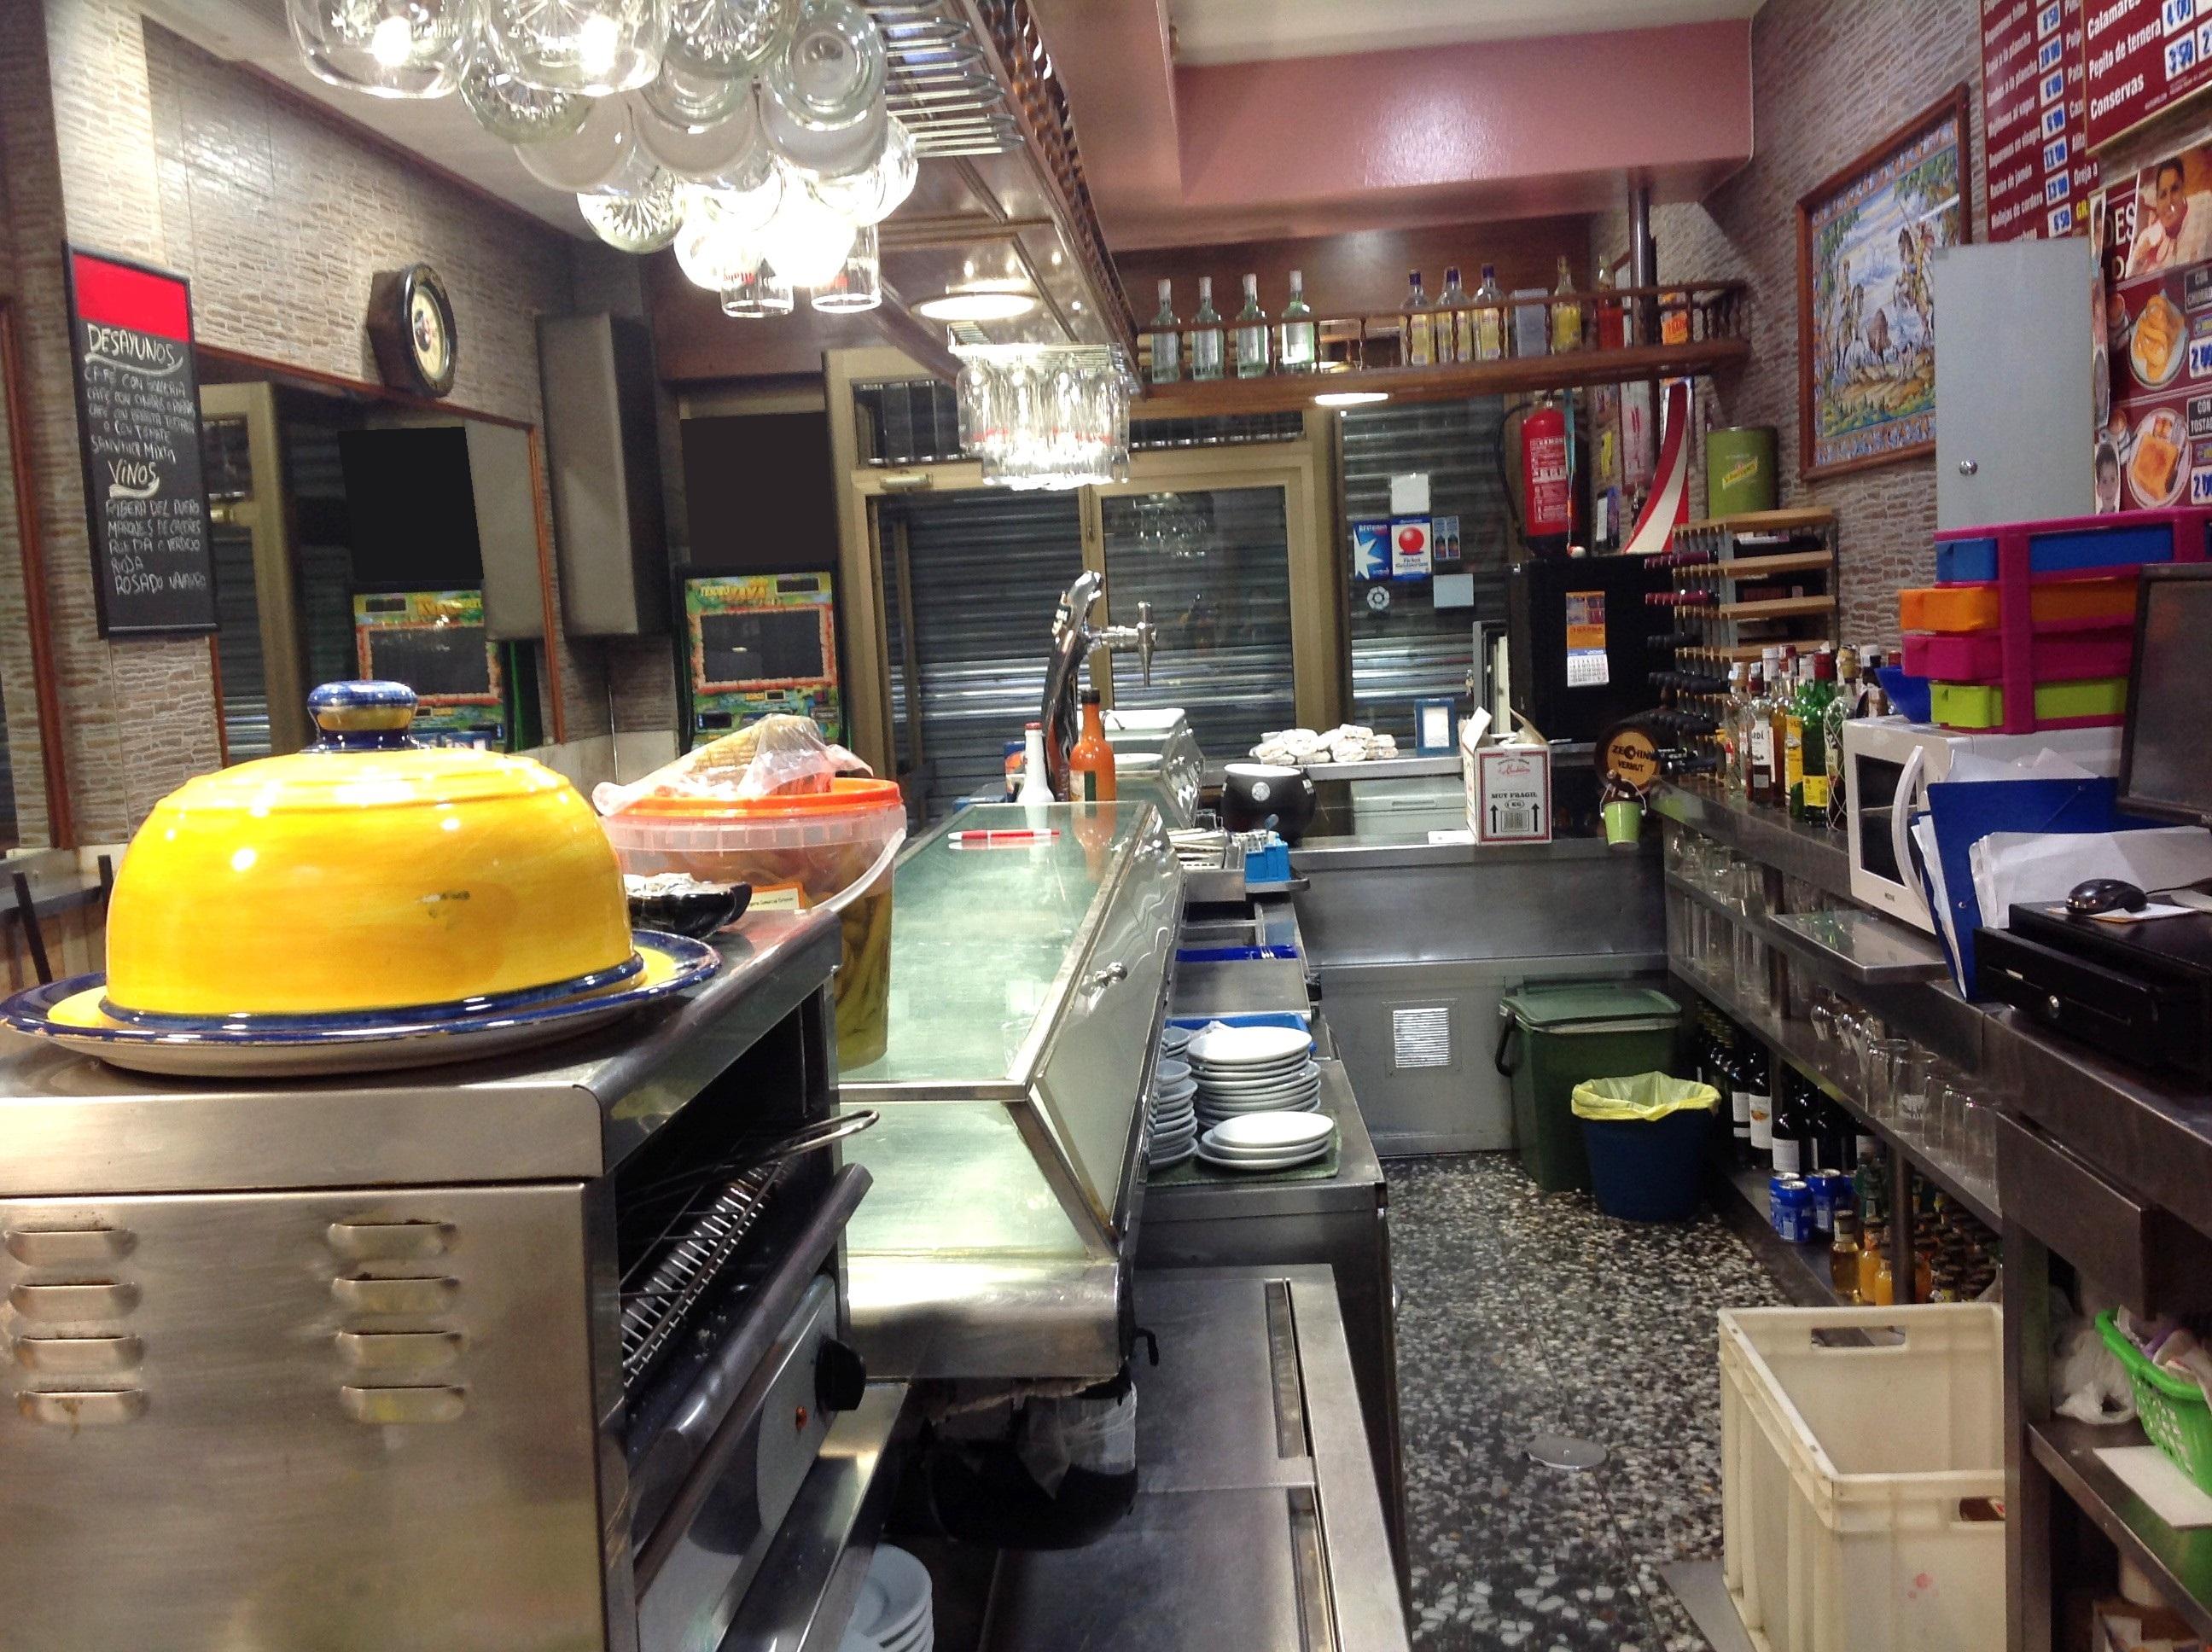 Dorable Ideas De Cocina Bar De Vinos Adorno - Ideas de Decoración de ...